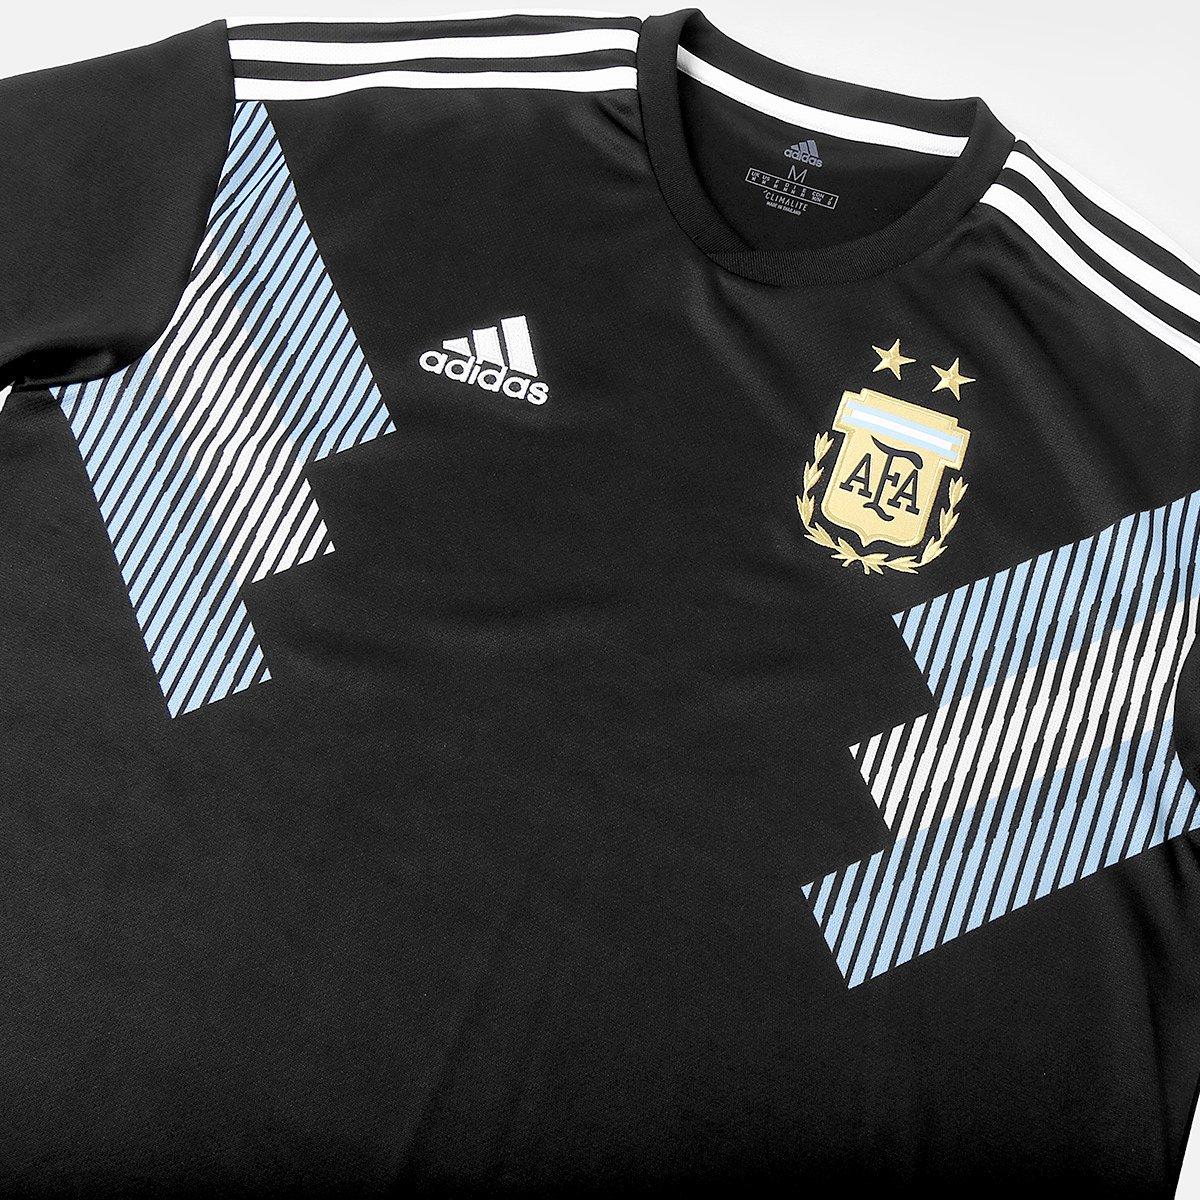 7dbb59ae74 Camisa Seleção Argentina Away 2018 n° 3 Tagliafico - Torcedor Adidas  Masculina ...